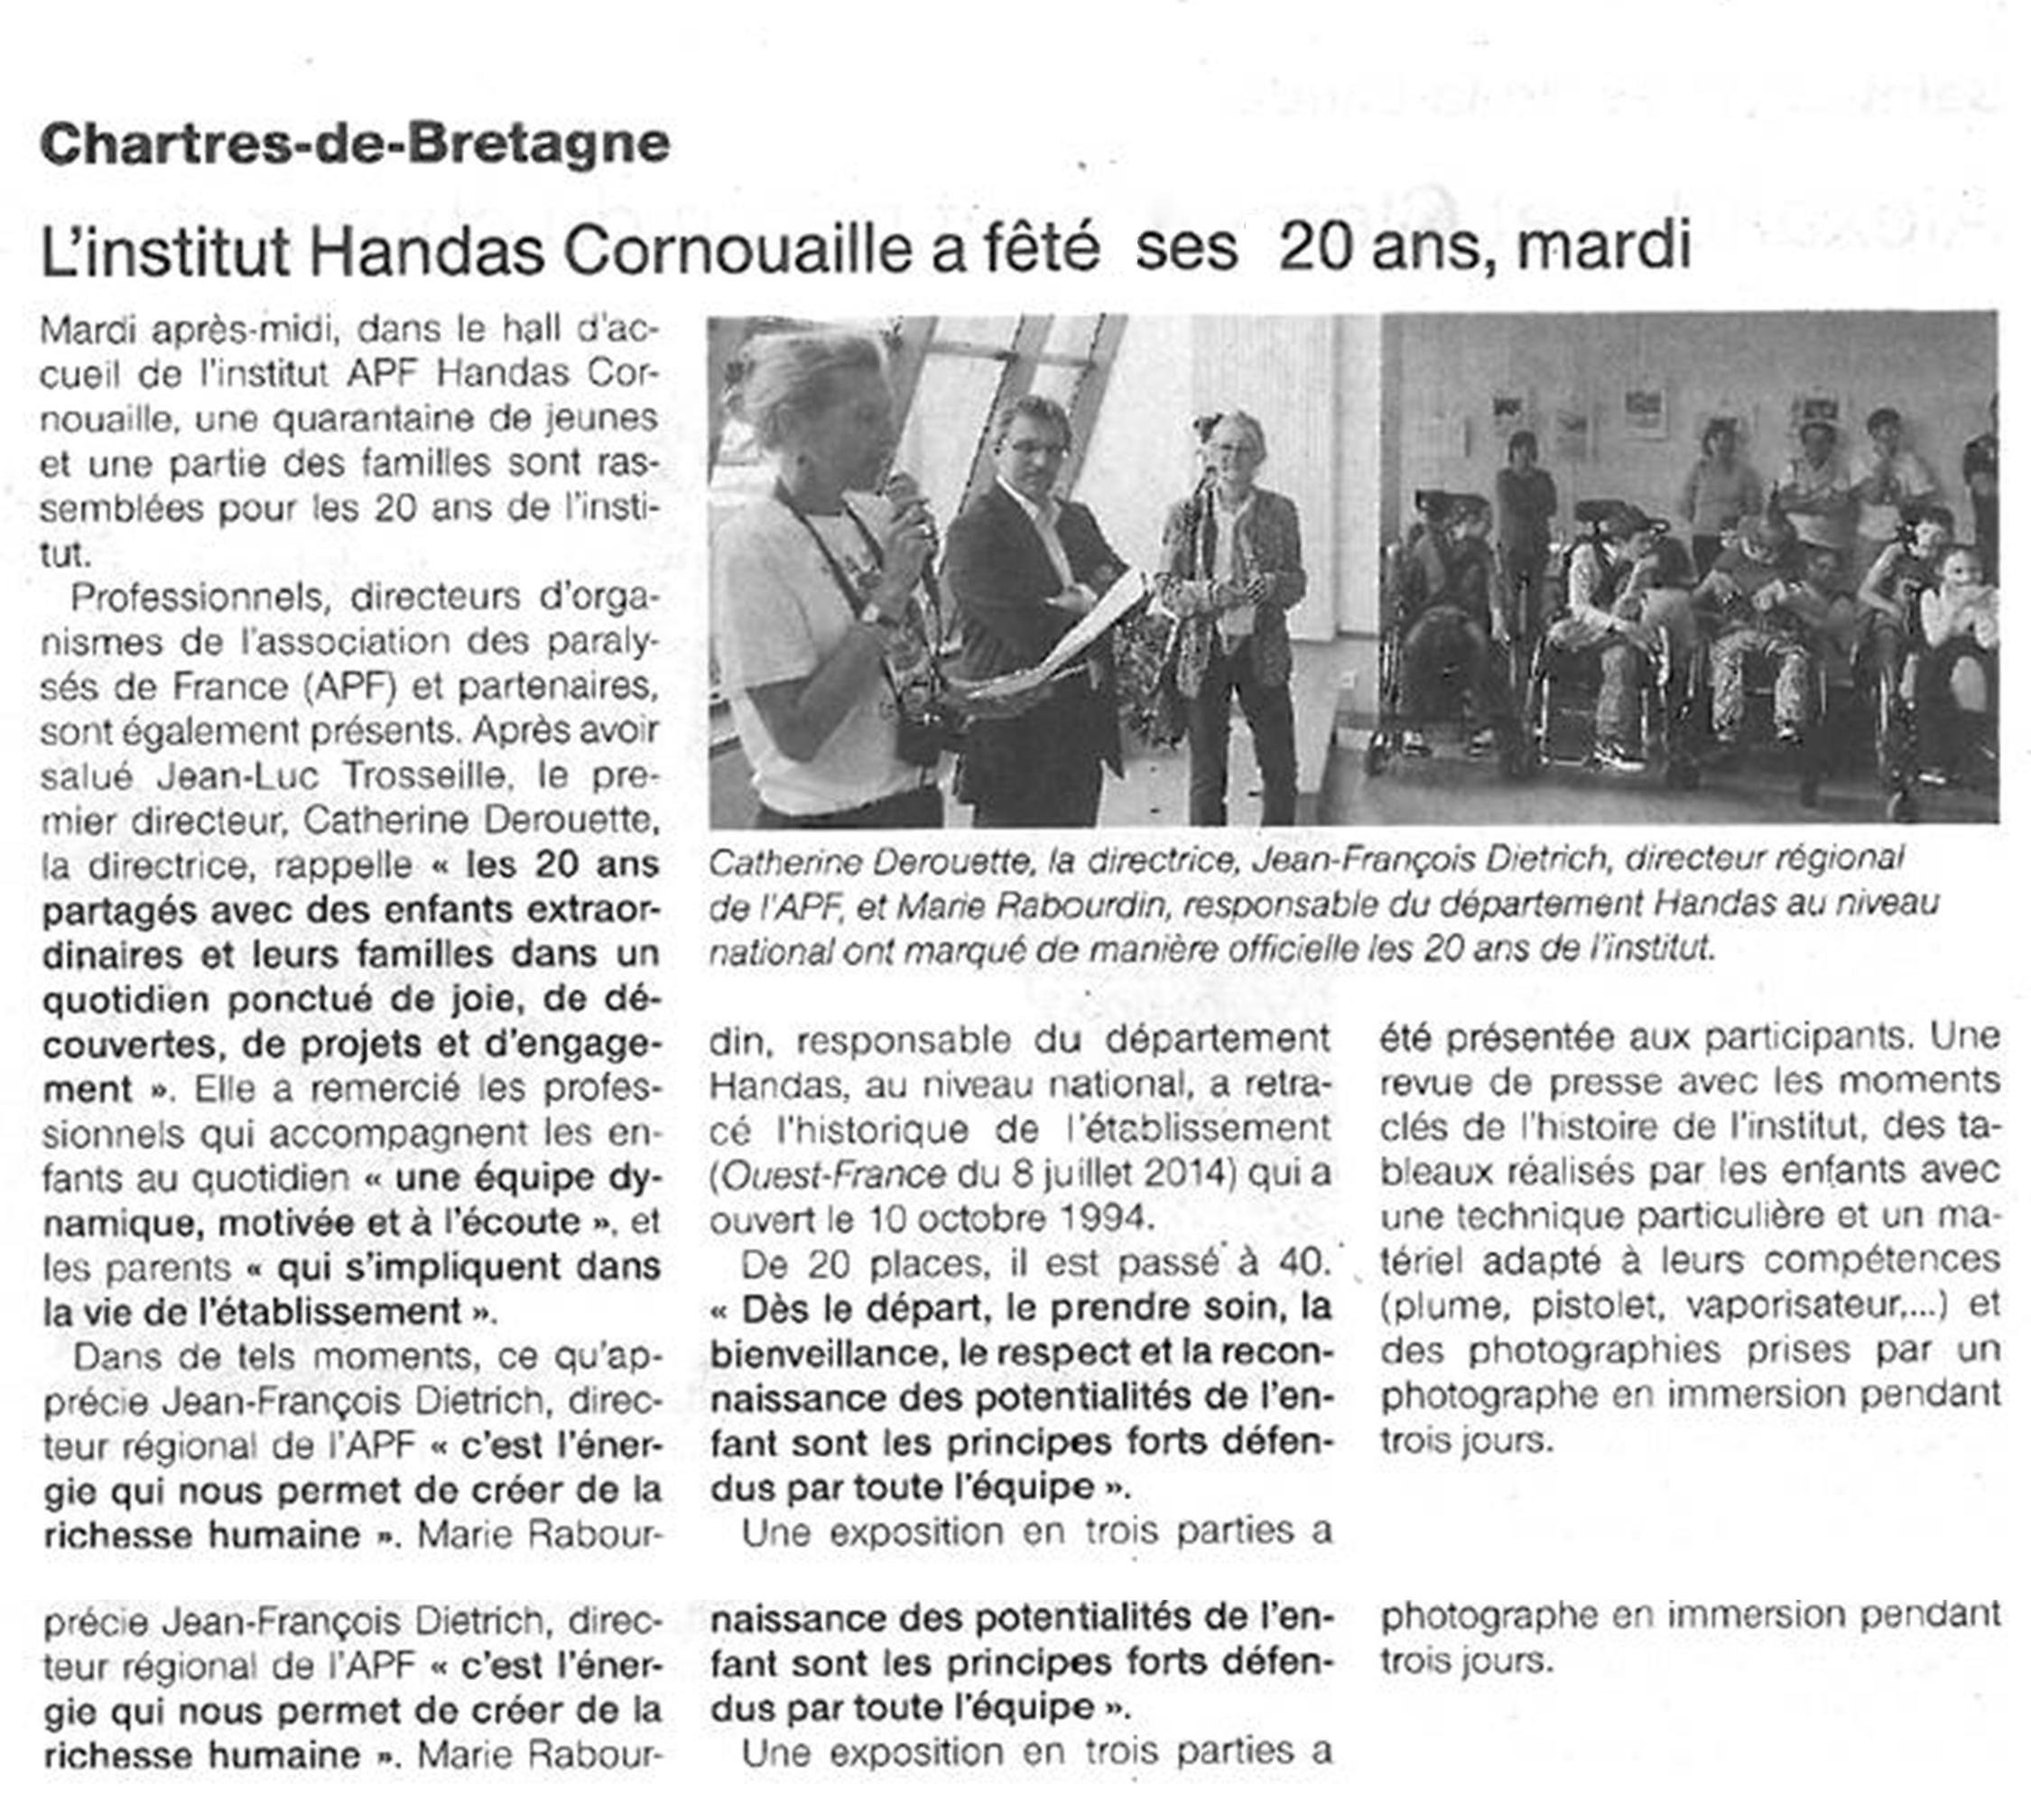 http://apfbretagne.blogs.apf.asso.fr/media/00/00/2956471016.jpg